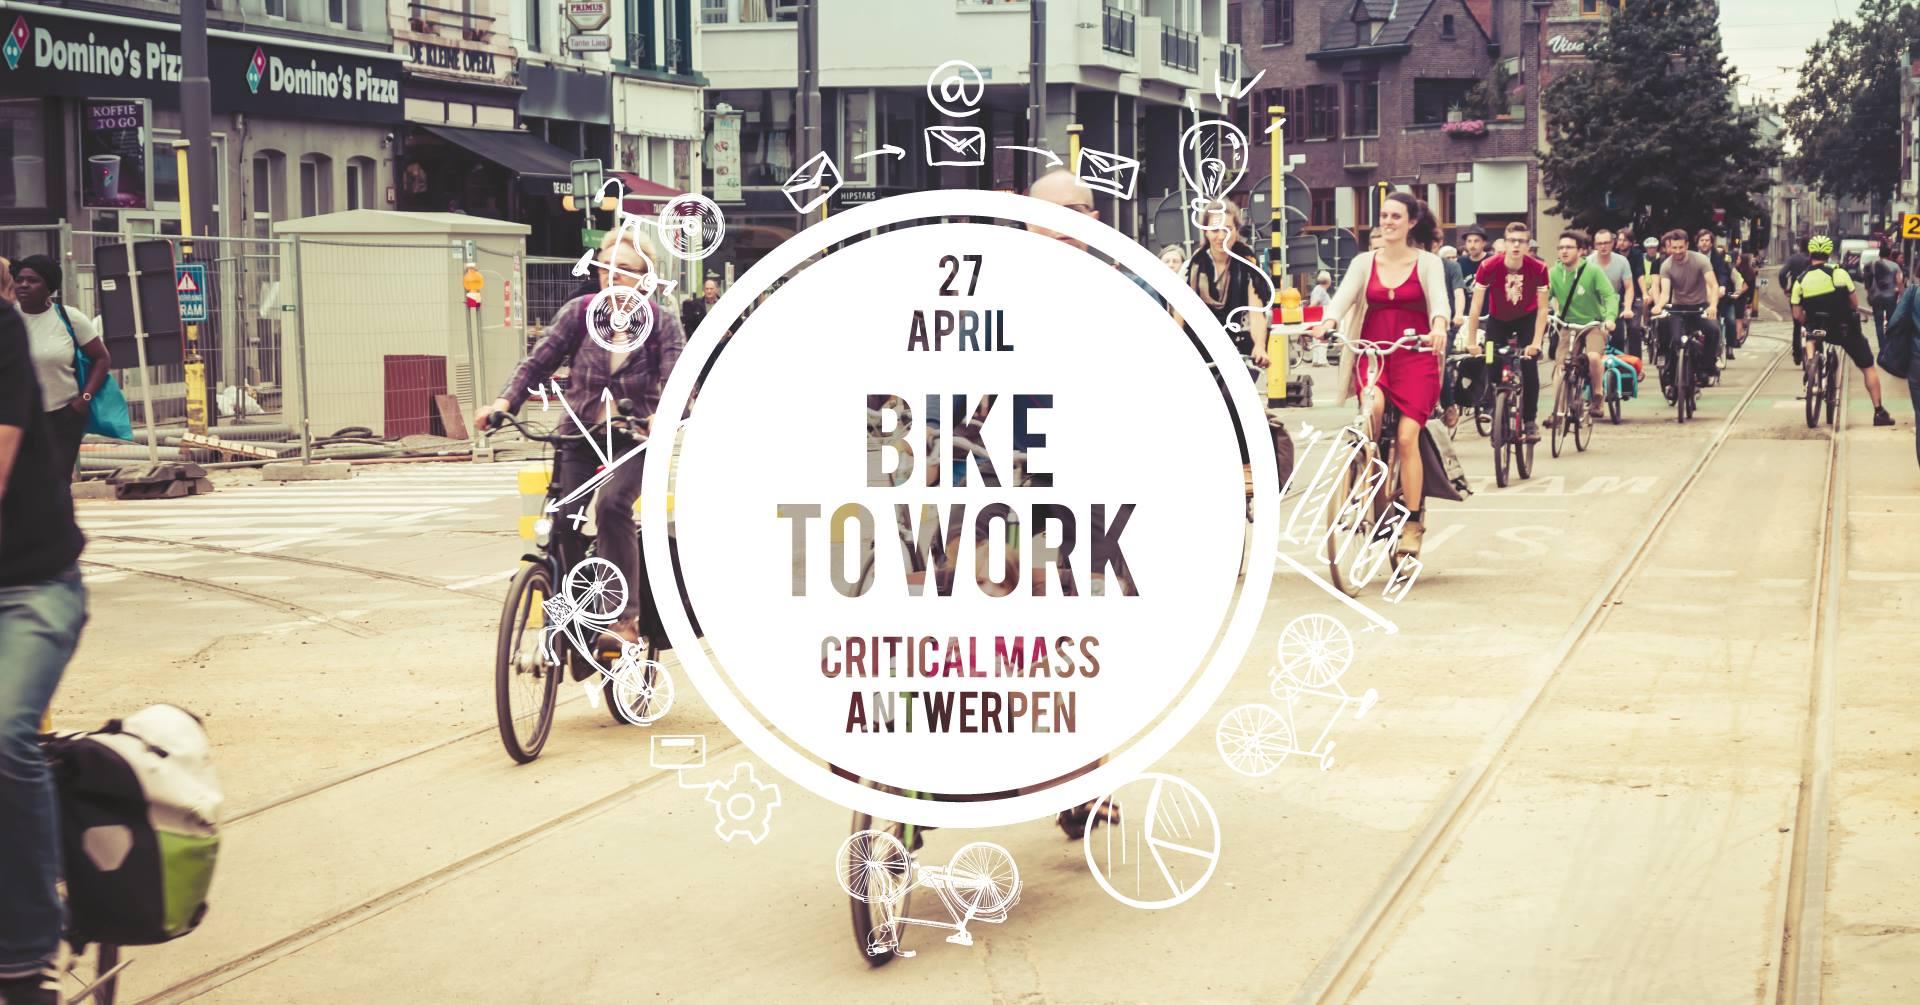 critical mass bike to work.jpg